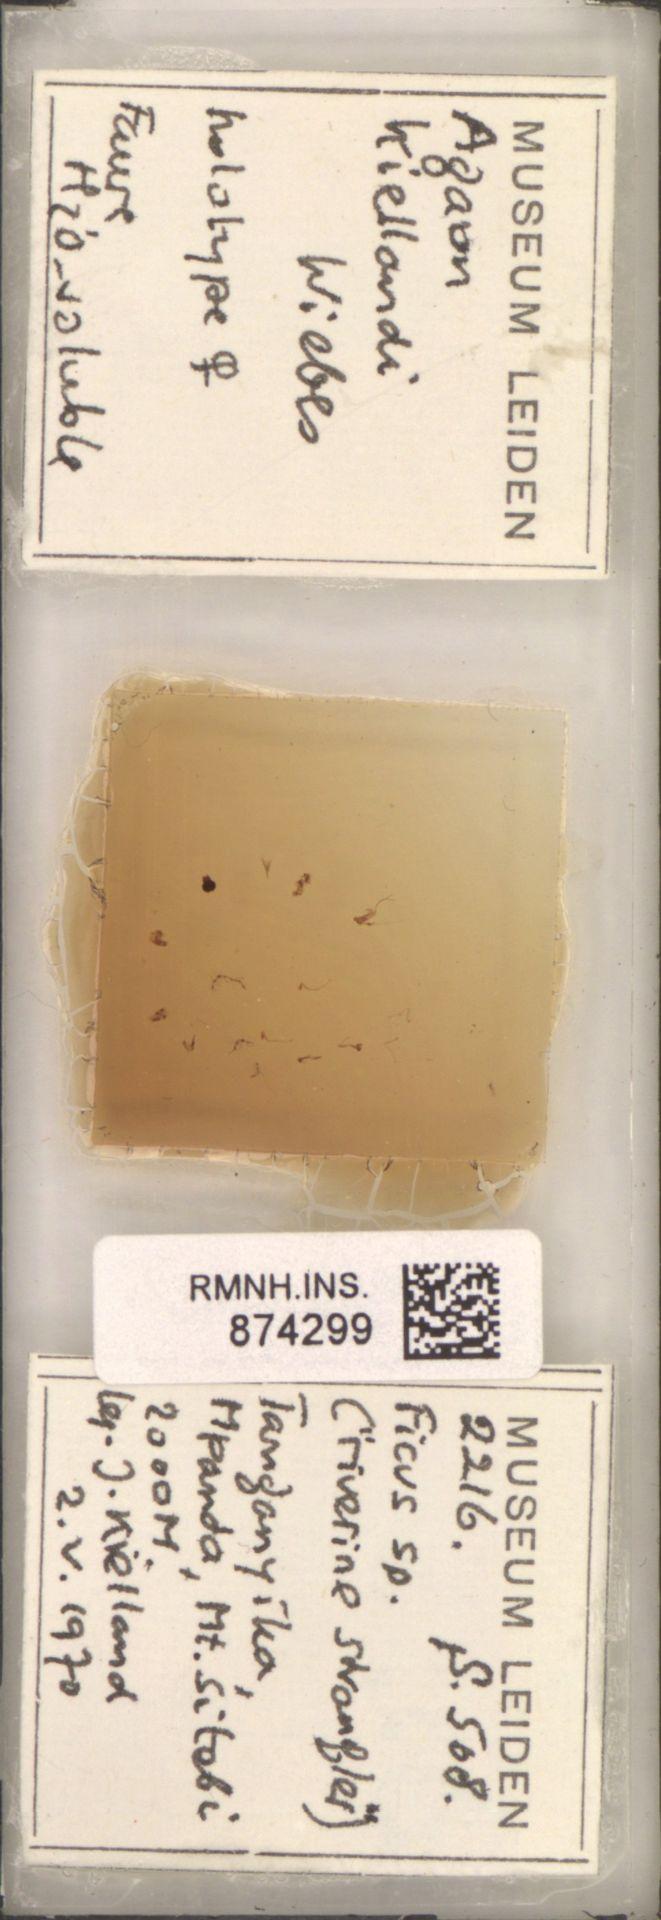 RMNH.INS.874299 | Agaon kiellandi Wiebes